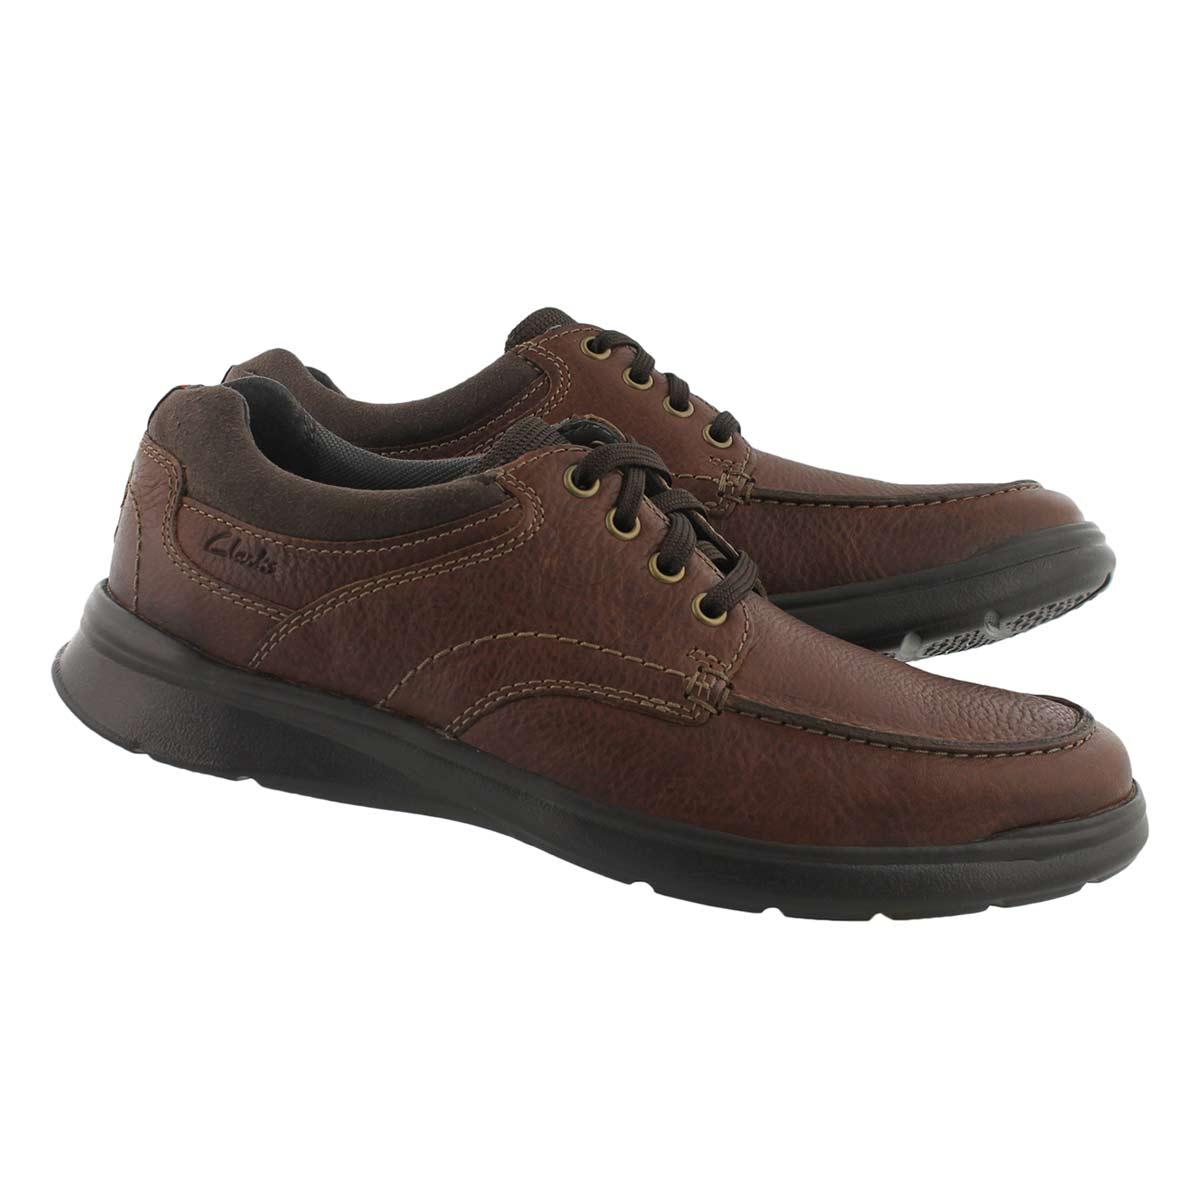 Men's COTRELL EDGE tobacco lace up shoes